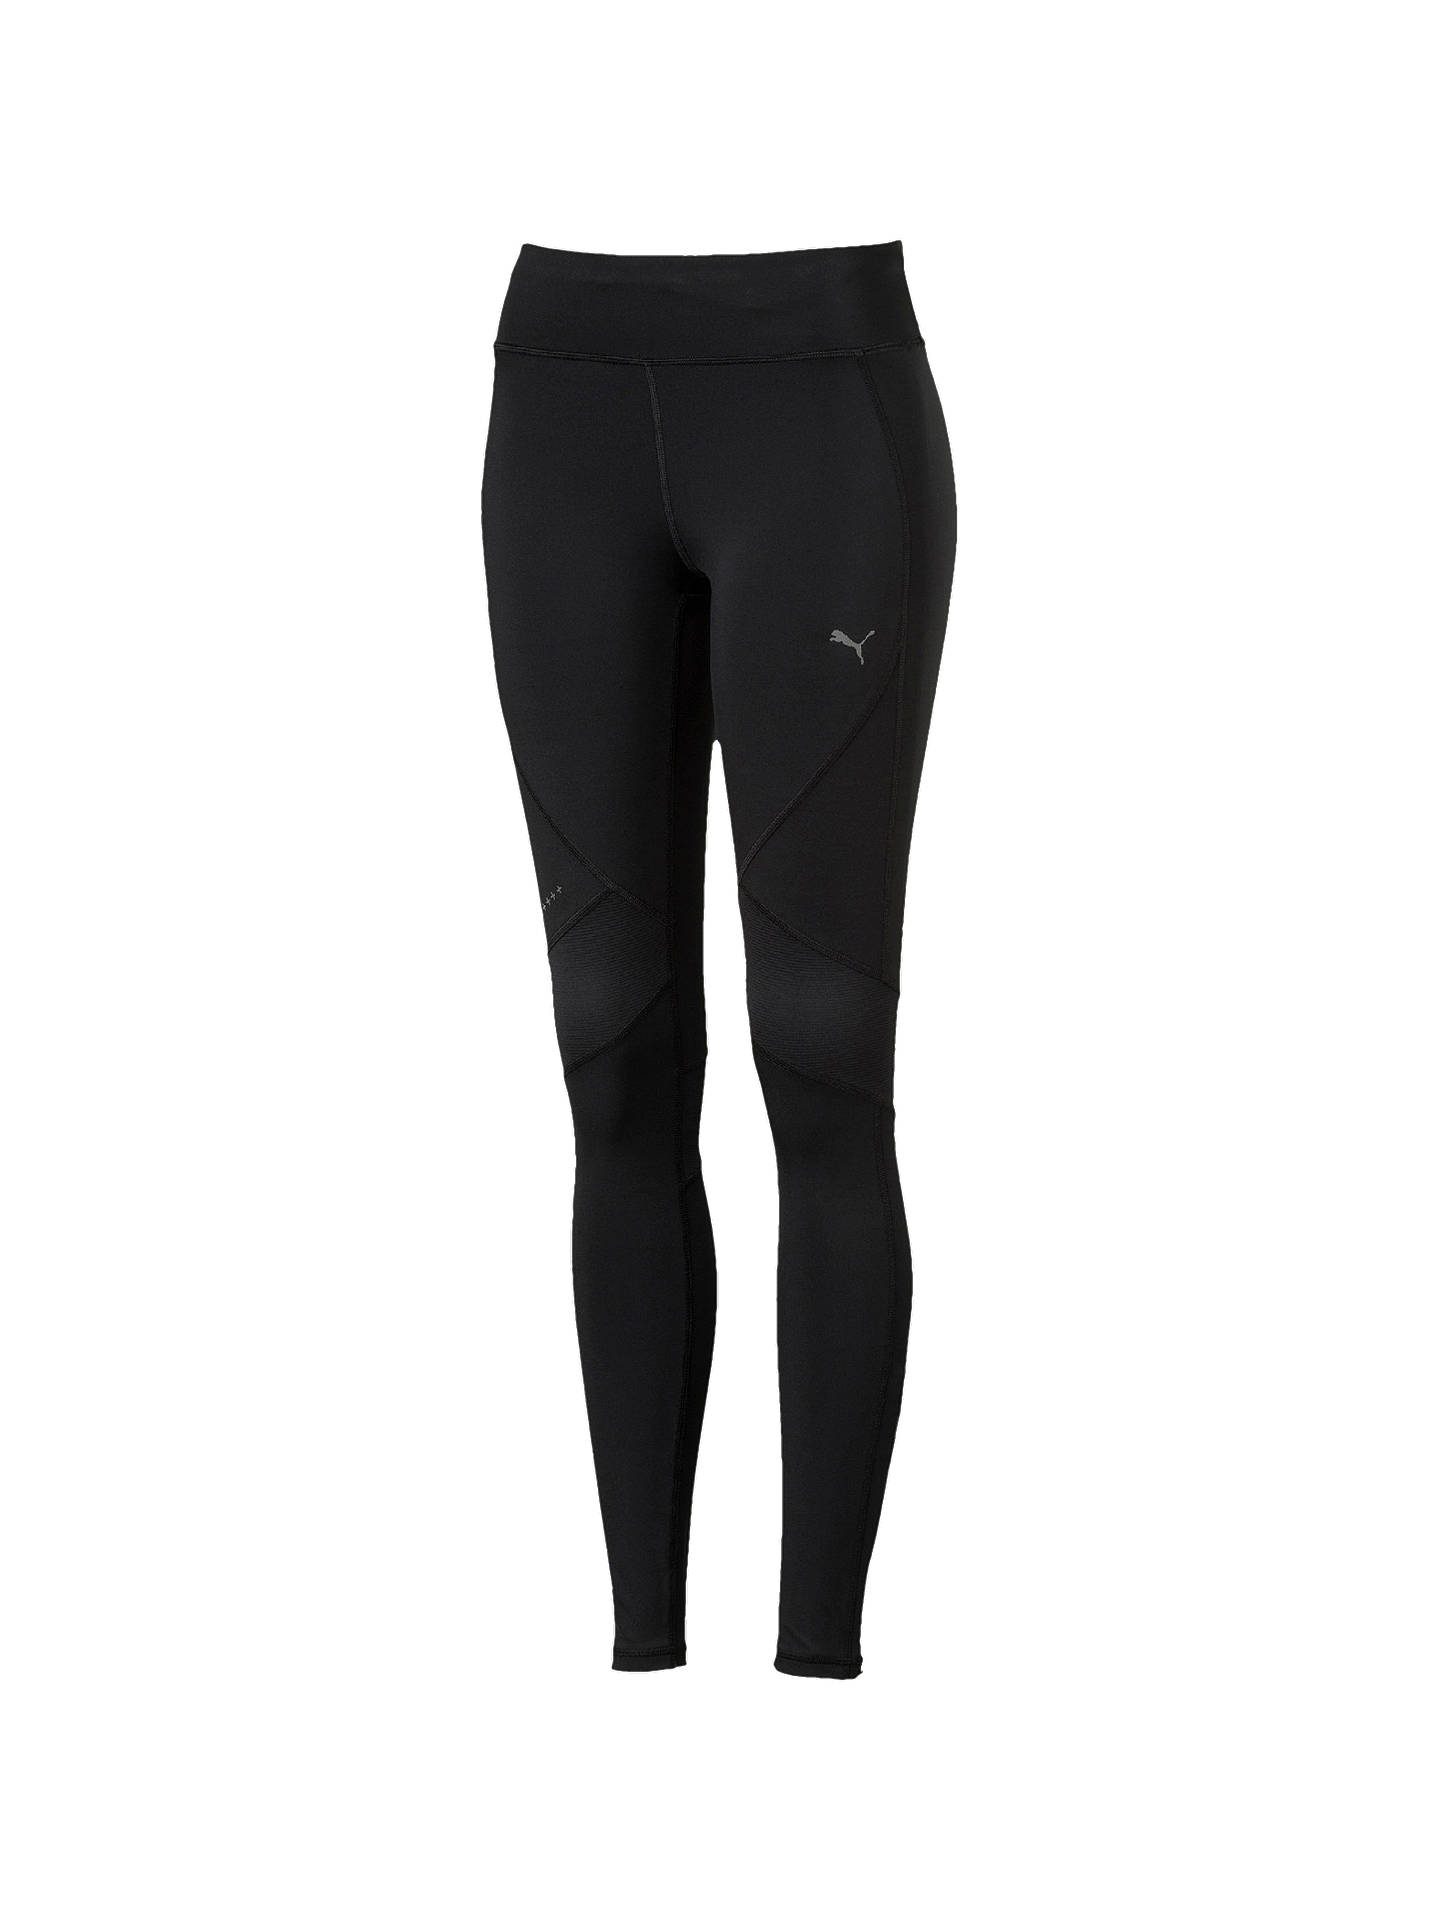 878154008fa Buy PUMA Ignite Long Running Leggings